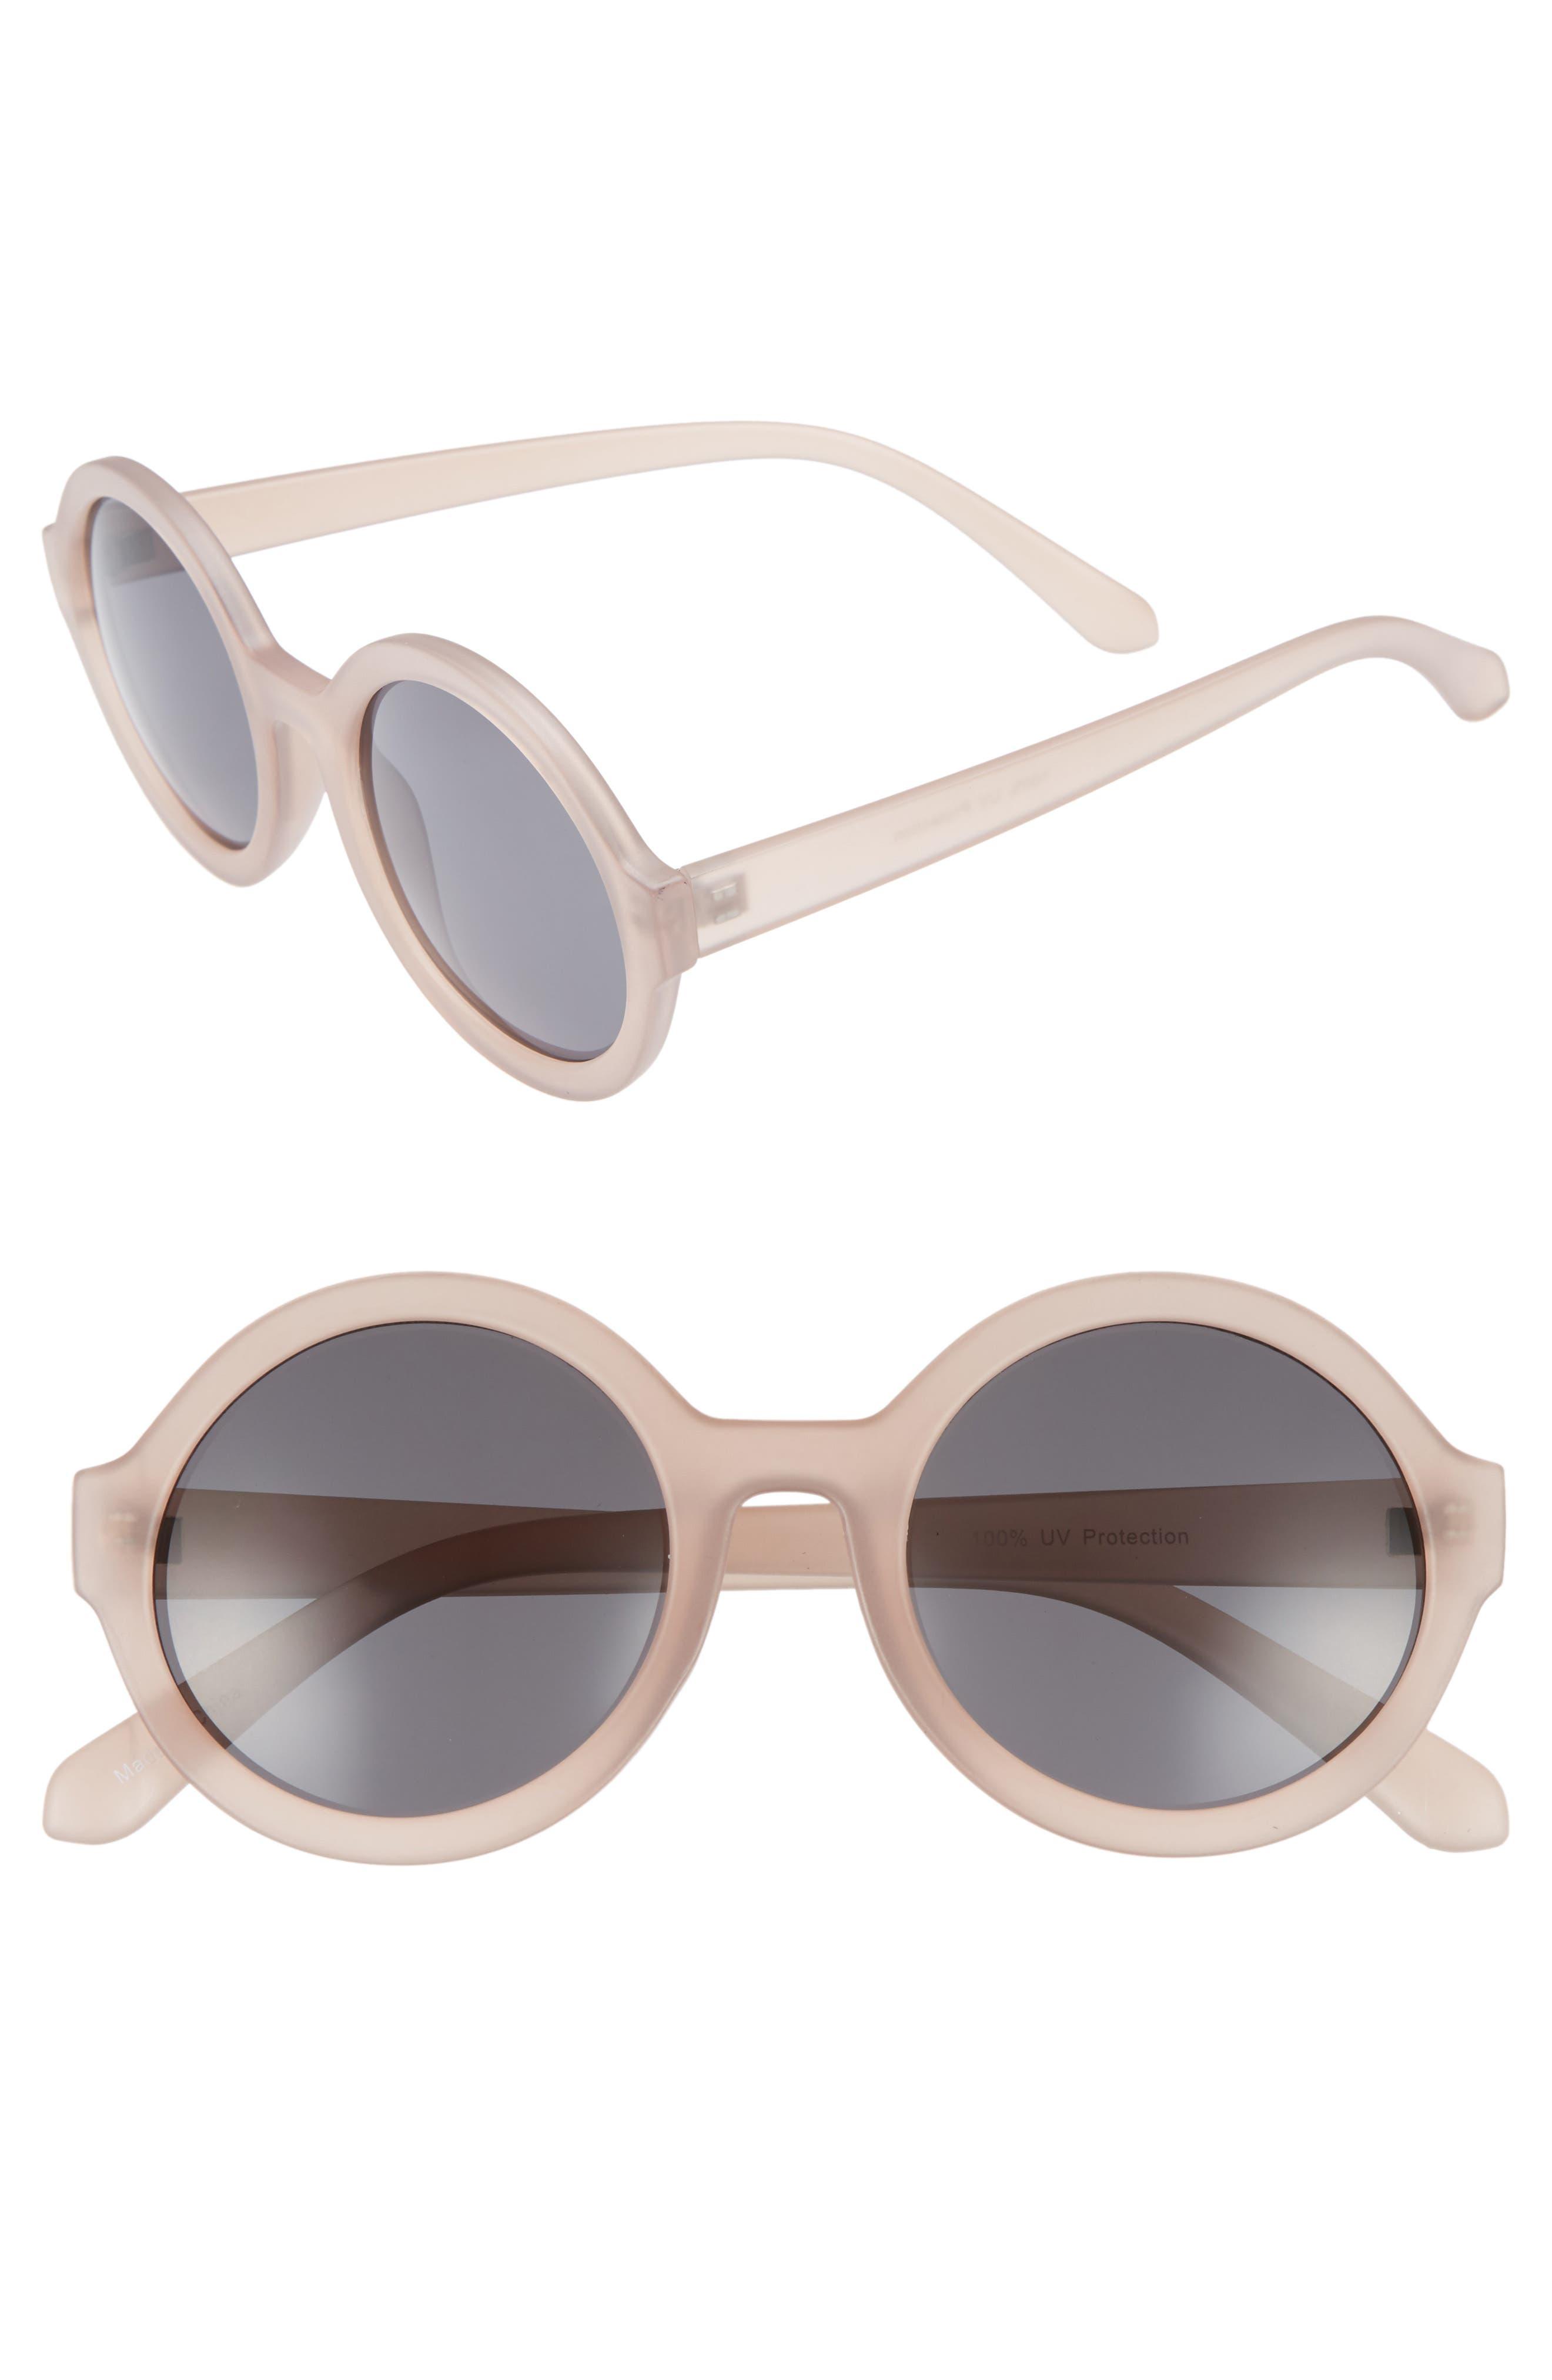 50mm Round Sunglasses,                         Main,                         color, Mauve